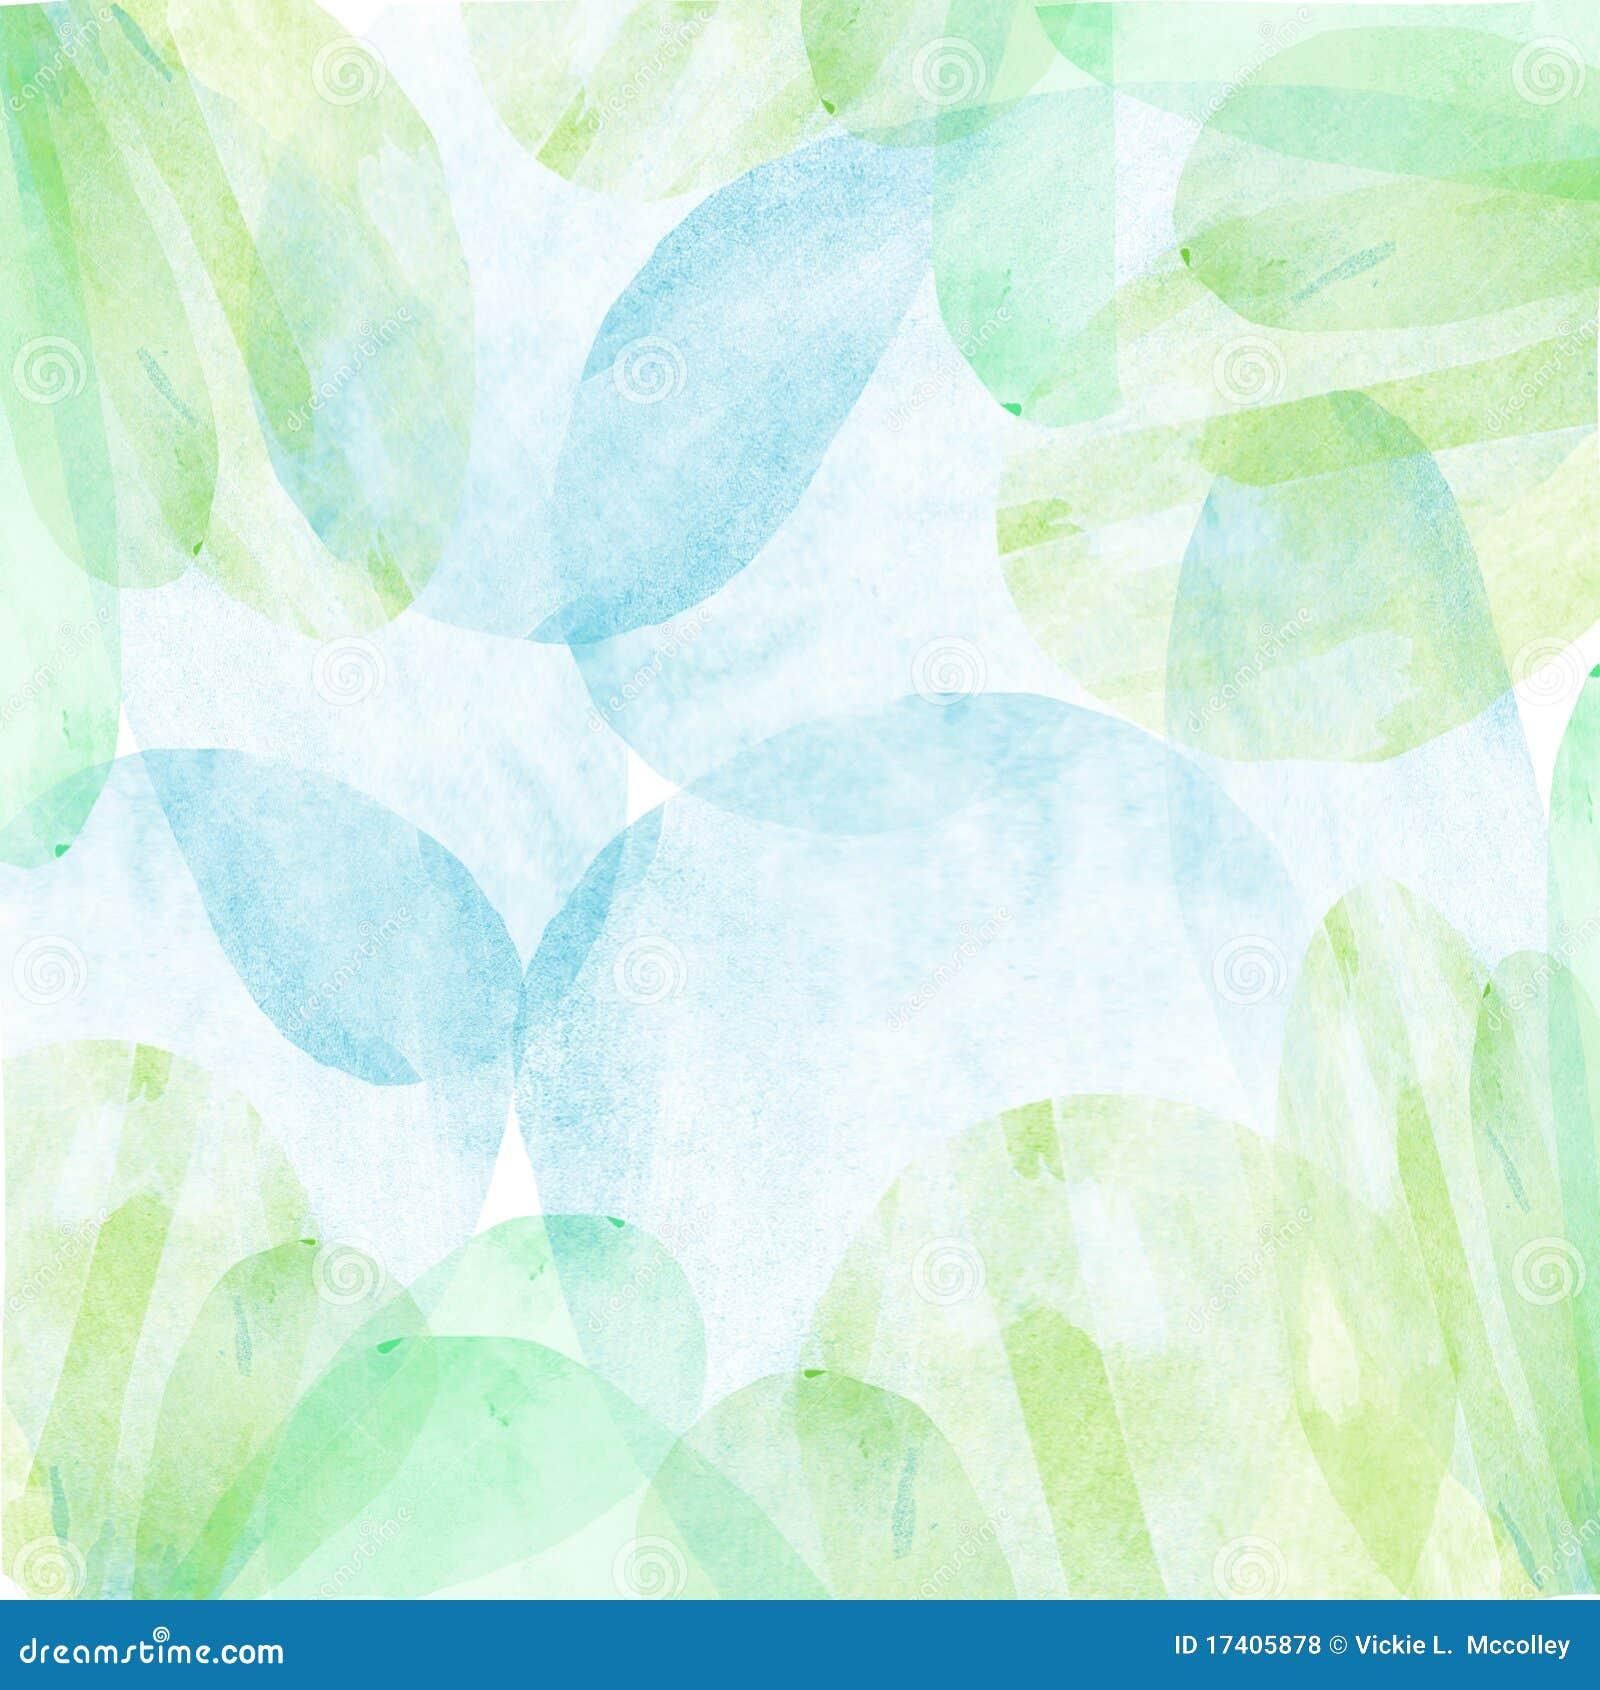 Relaxing Colors Pastel Watercolor Wallpaper Stock Illustration